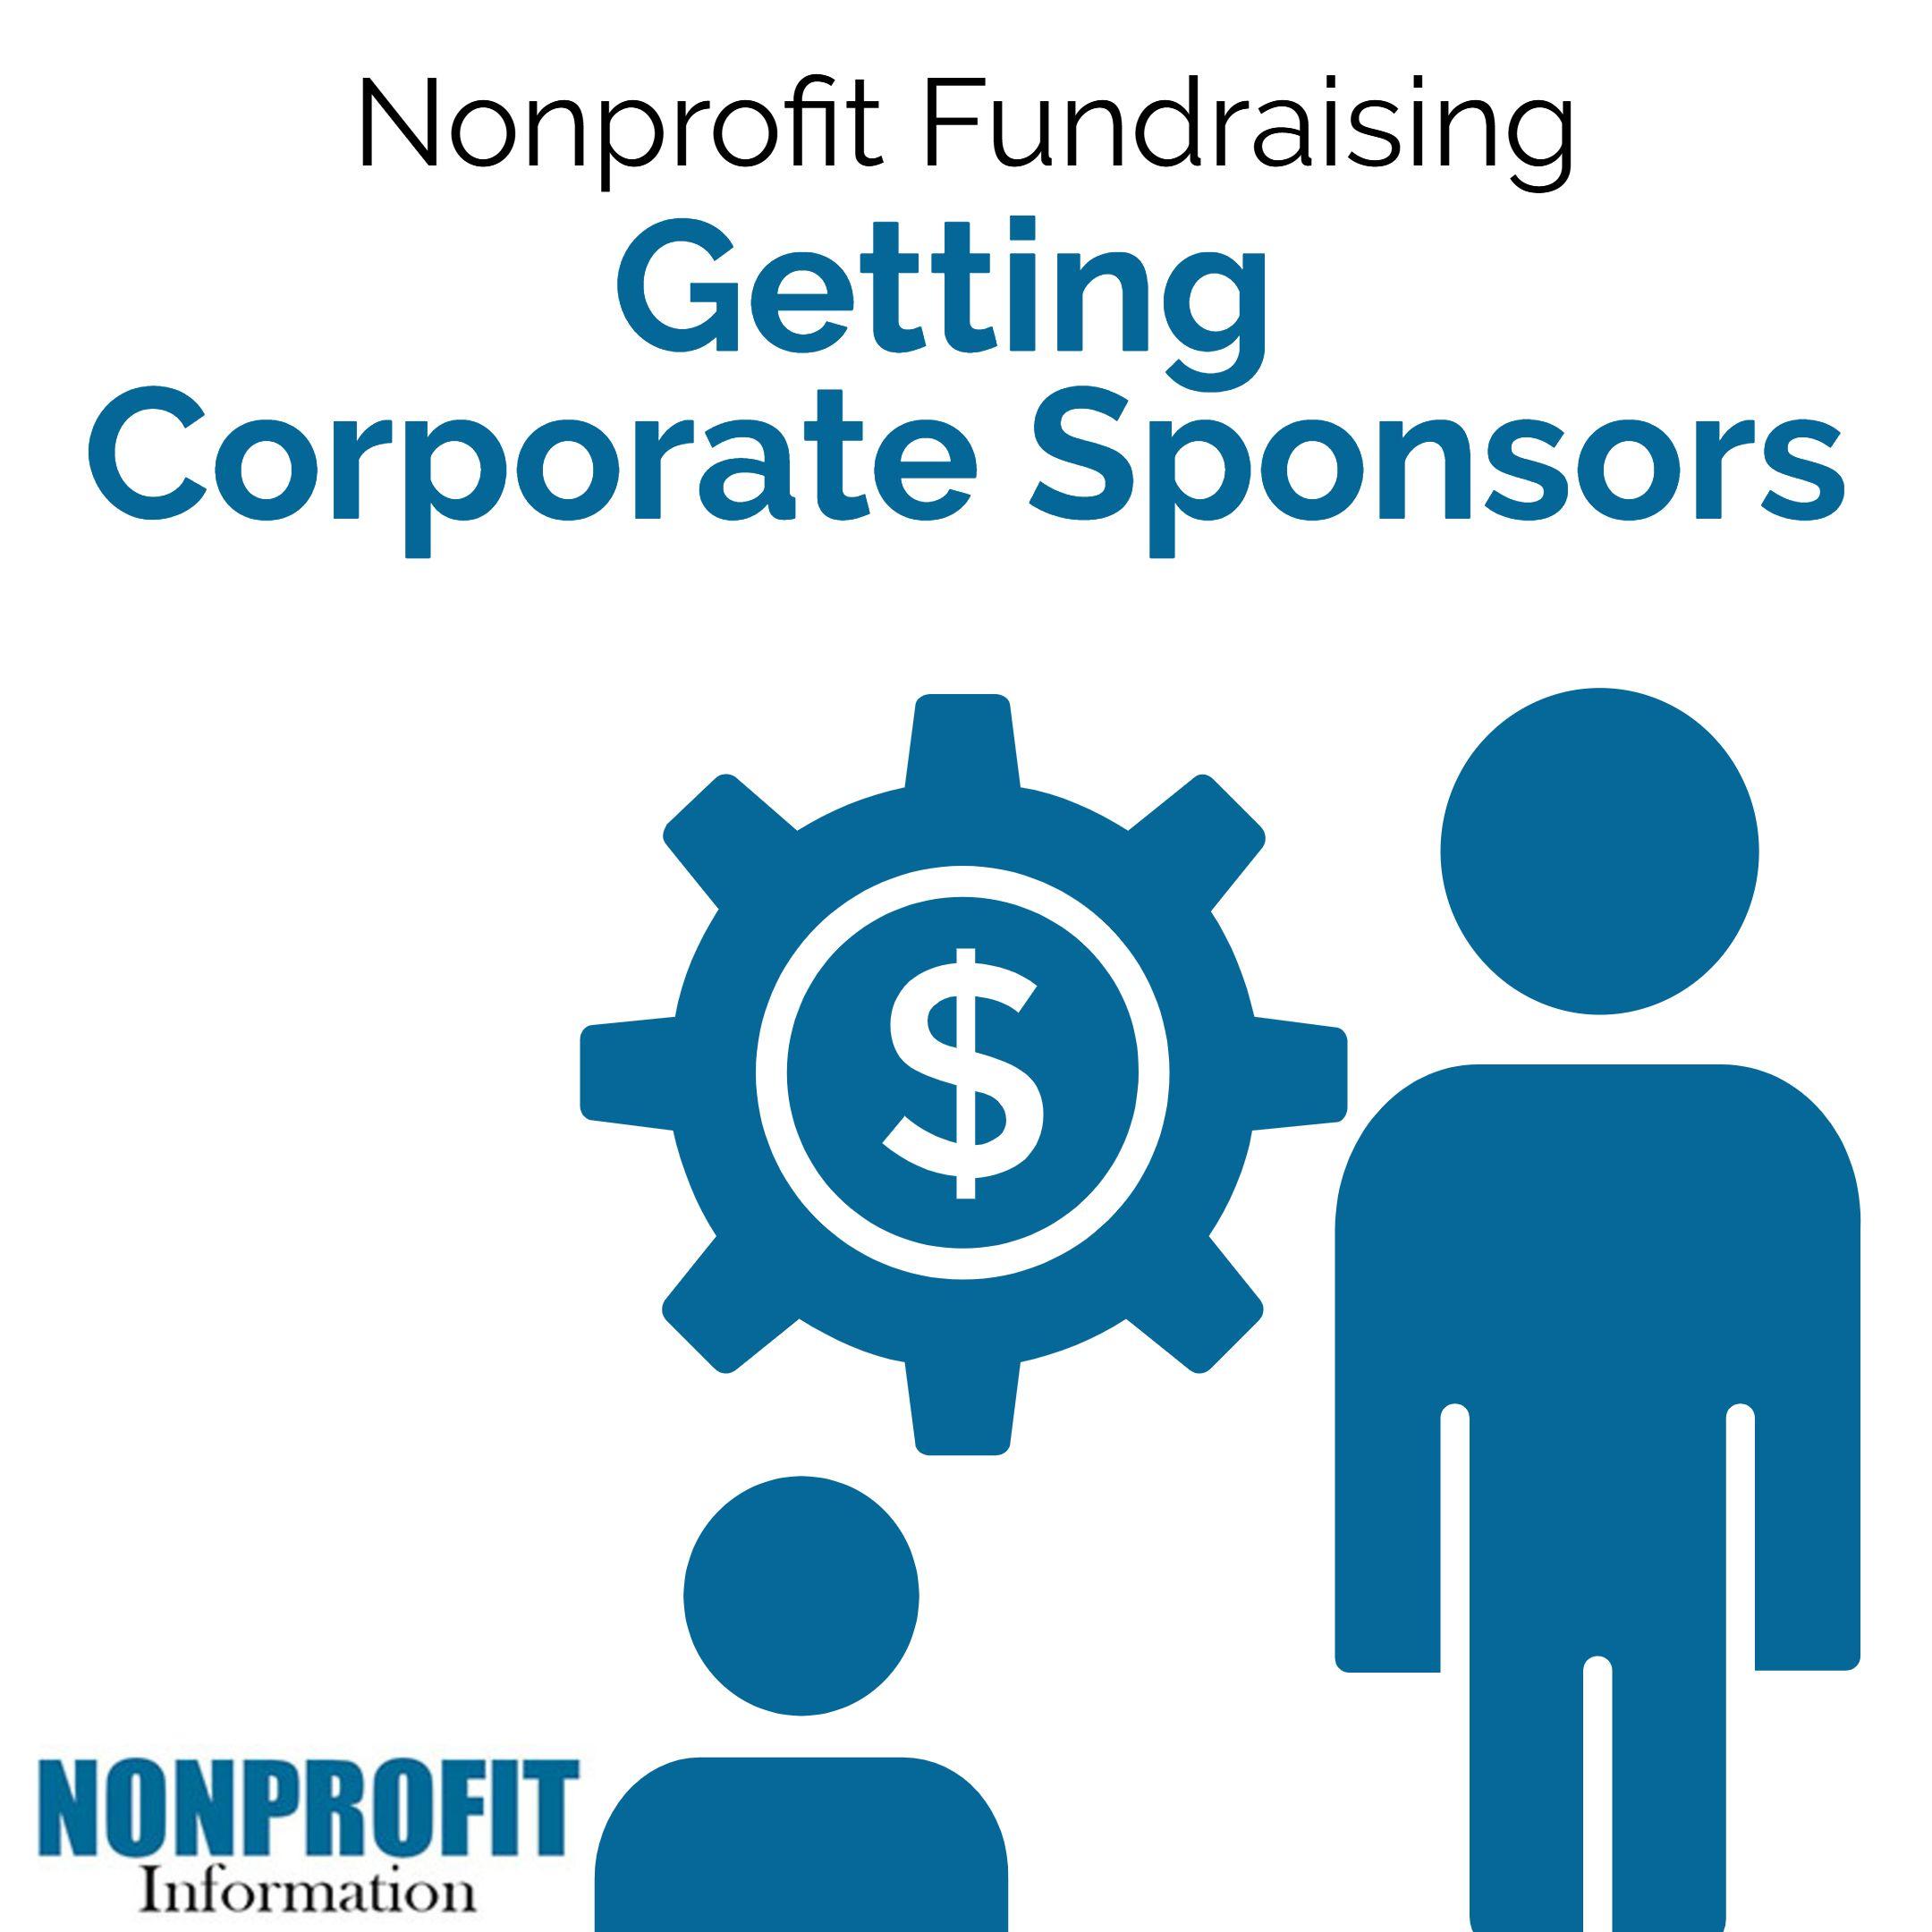 How To Get Sponsors For Nonprofit Nonprofit Sponsors Nonprofit Fundraising Charity Work Ideas Sponsorship Program